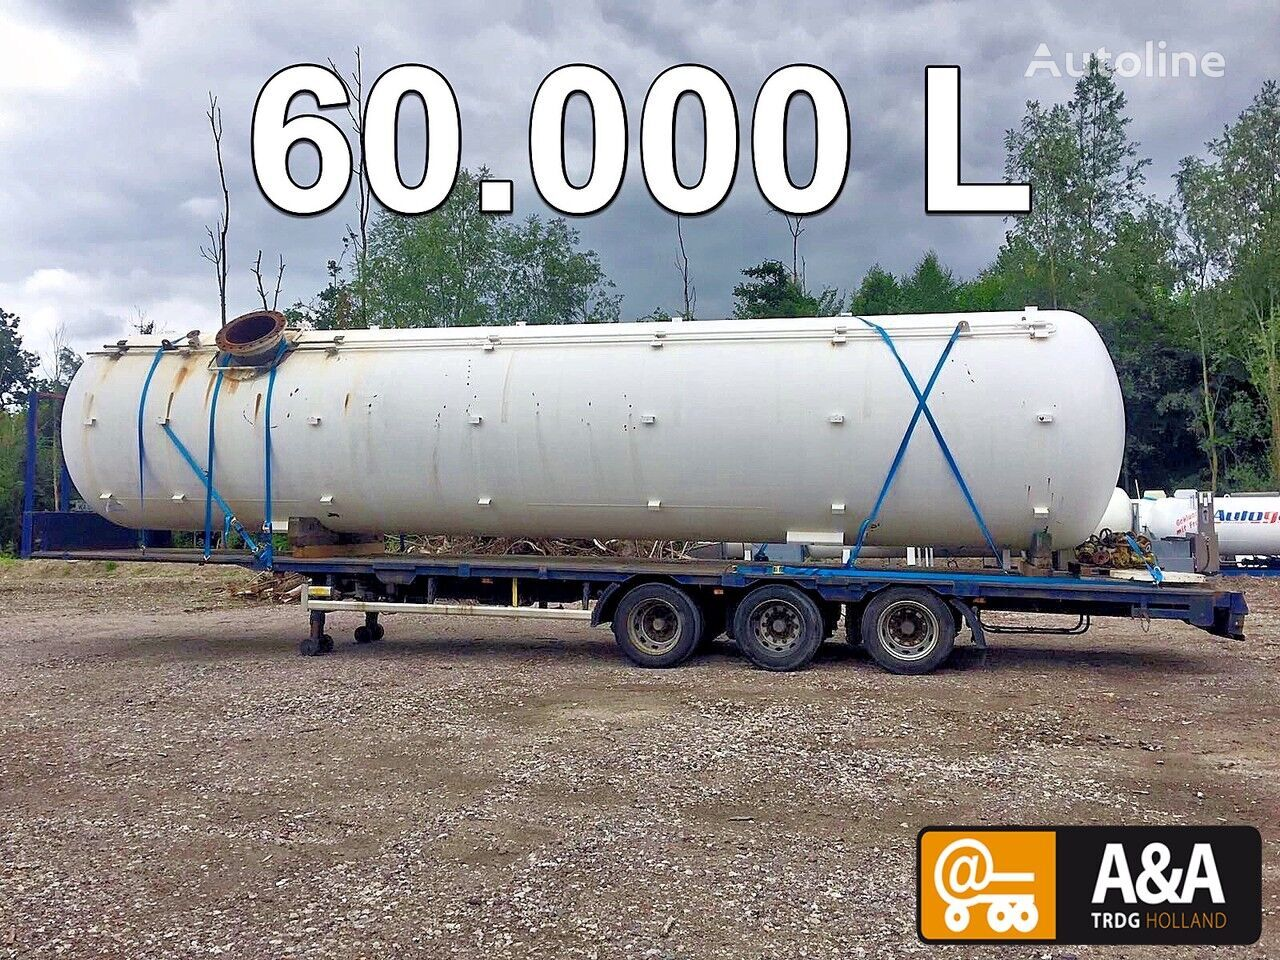 Propane Butane LPG GPL gastank gaz 60.000 L gas tank trailer